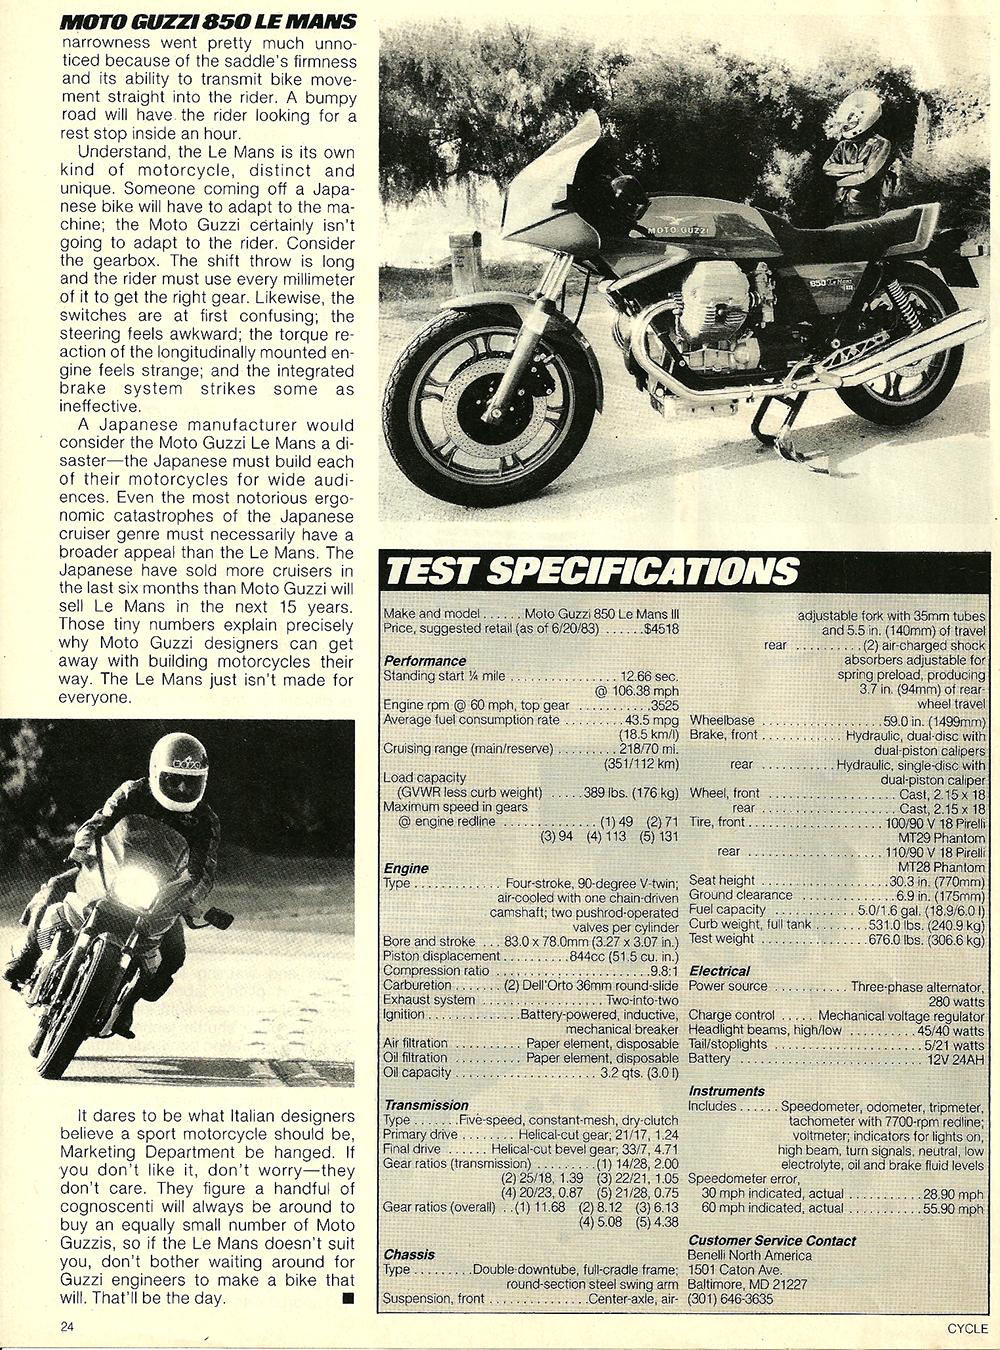 1983 Moto Guzzi 850 Lemans 3 road test 7.jpg